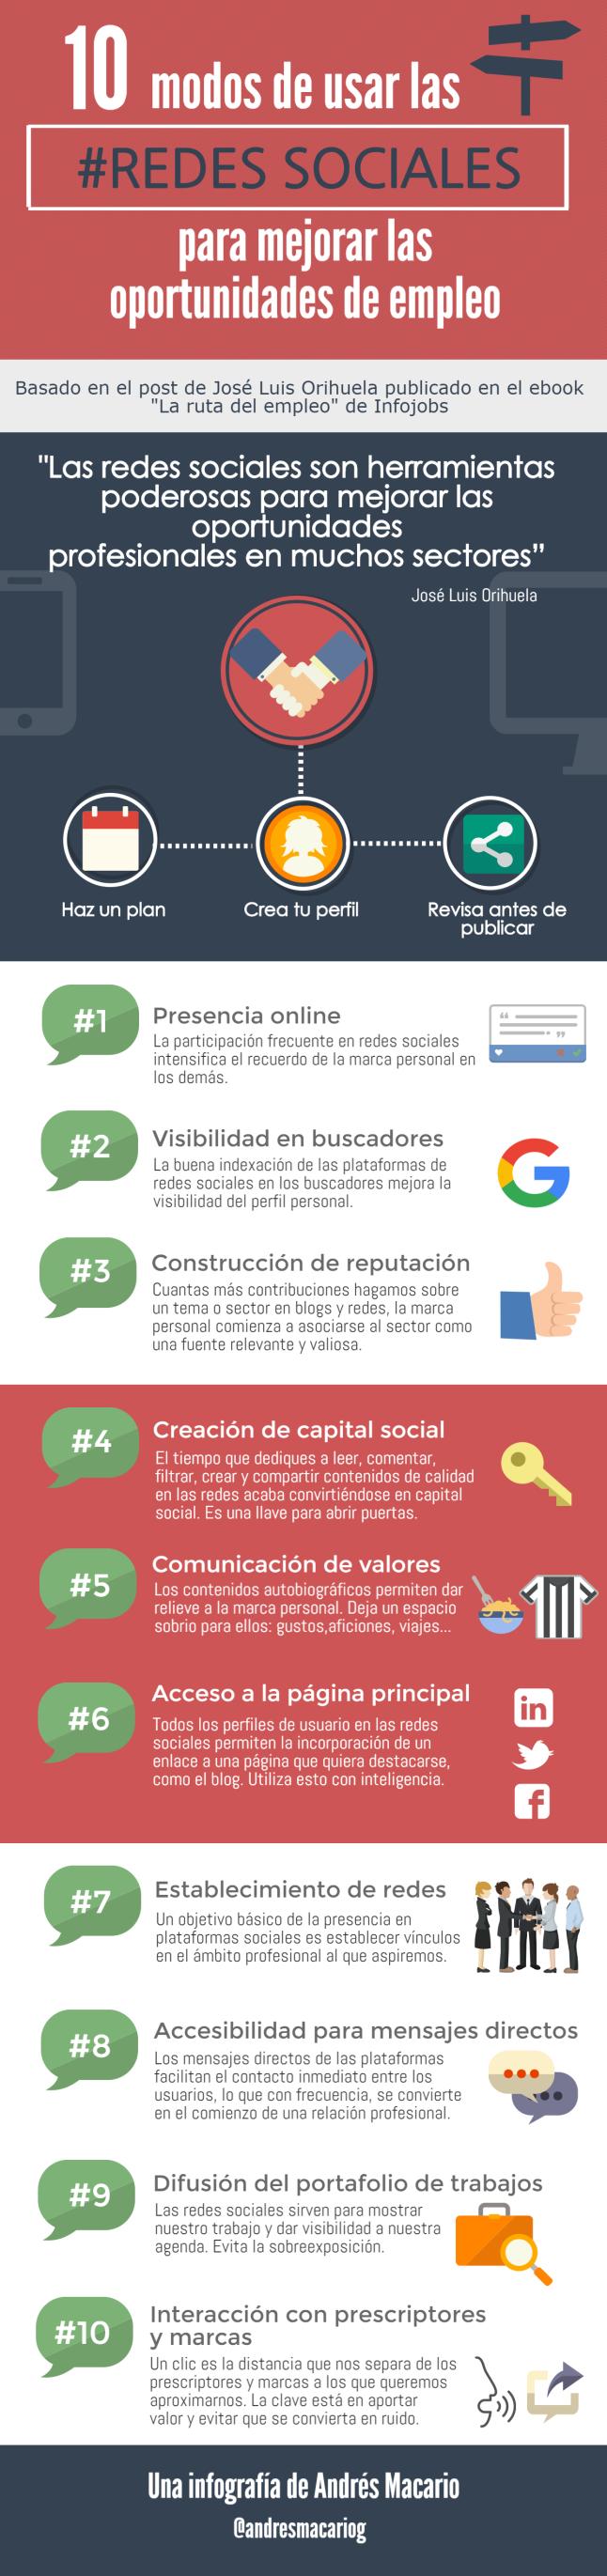 10 formas de usar las RRSS buscar empleo -Infografia Andres Macario